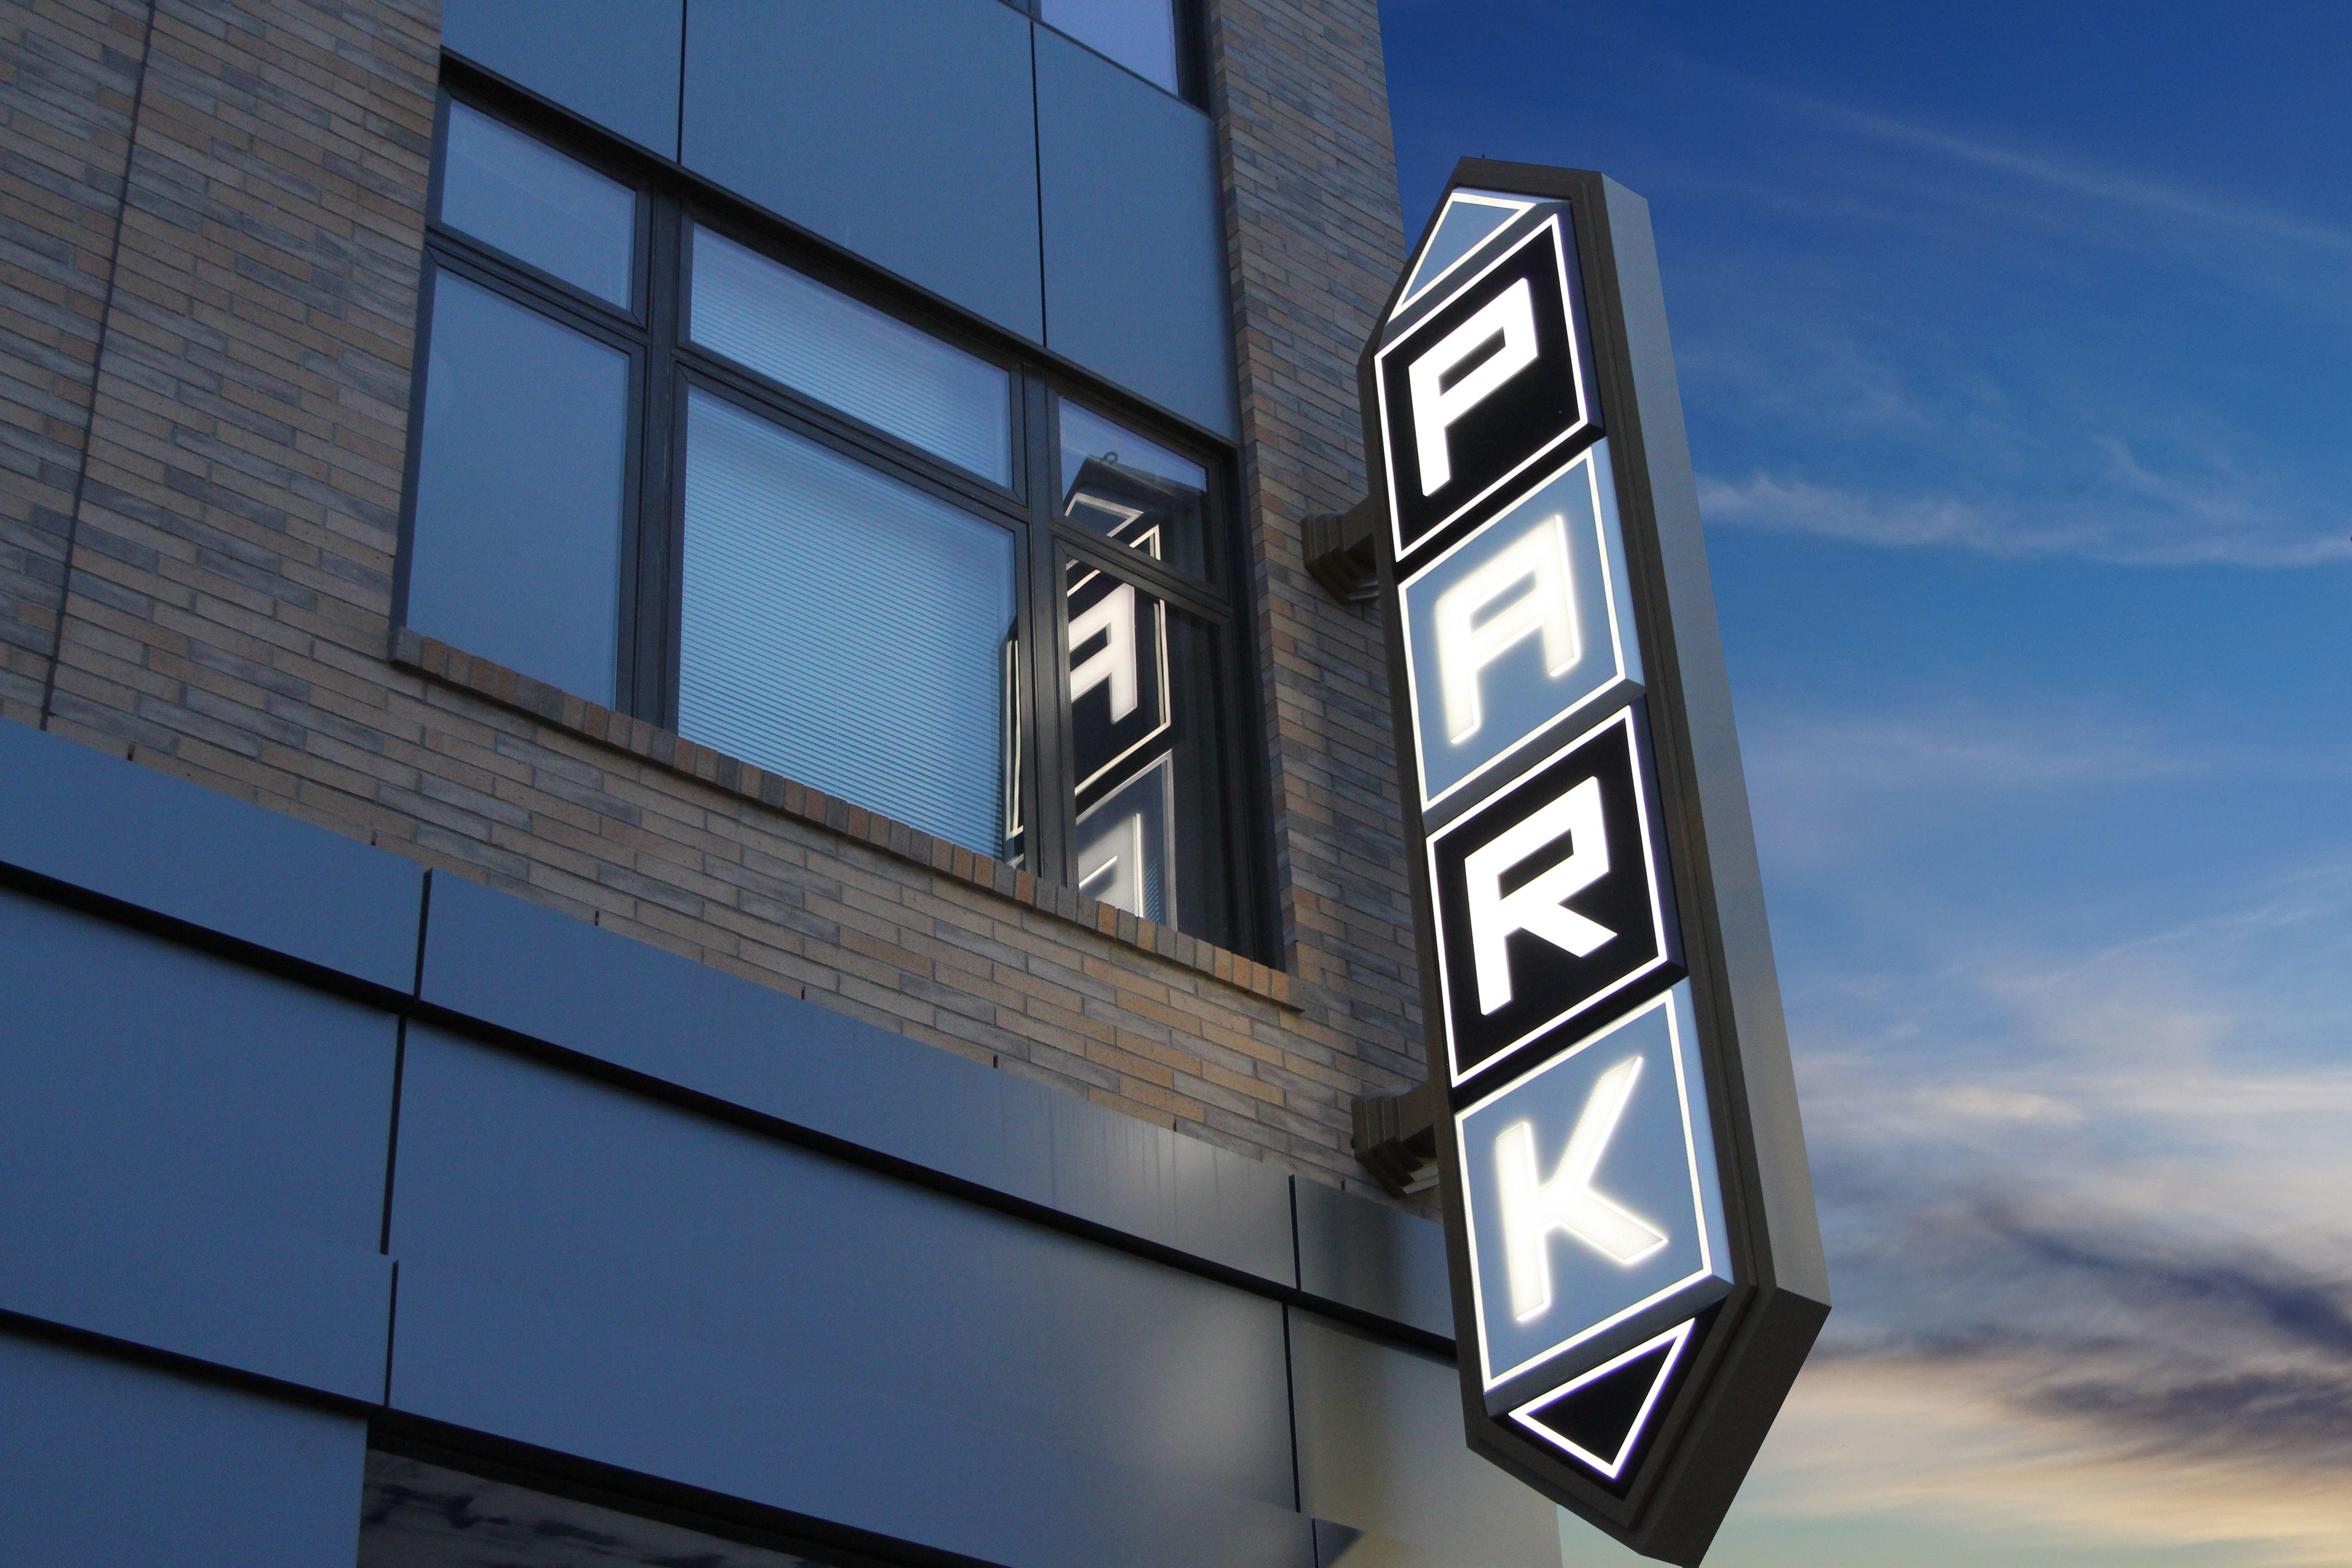 Parking Garage Sign Double Sided And Illuminated Design By Forseer Sign Park Signage Digital Signage Web Banner Design